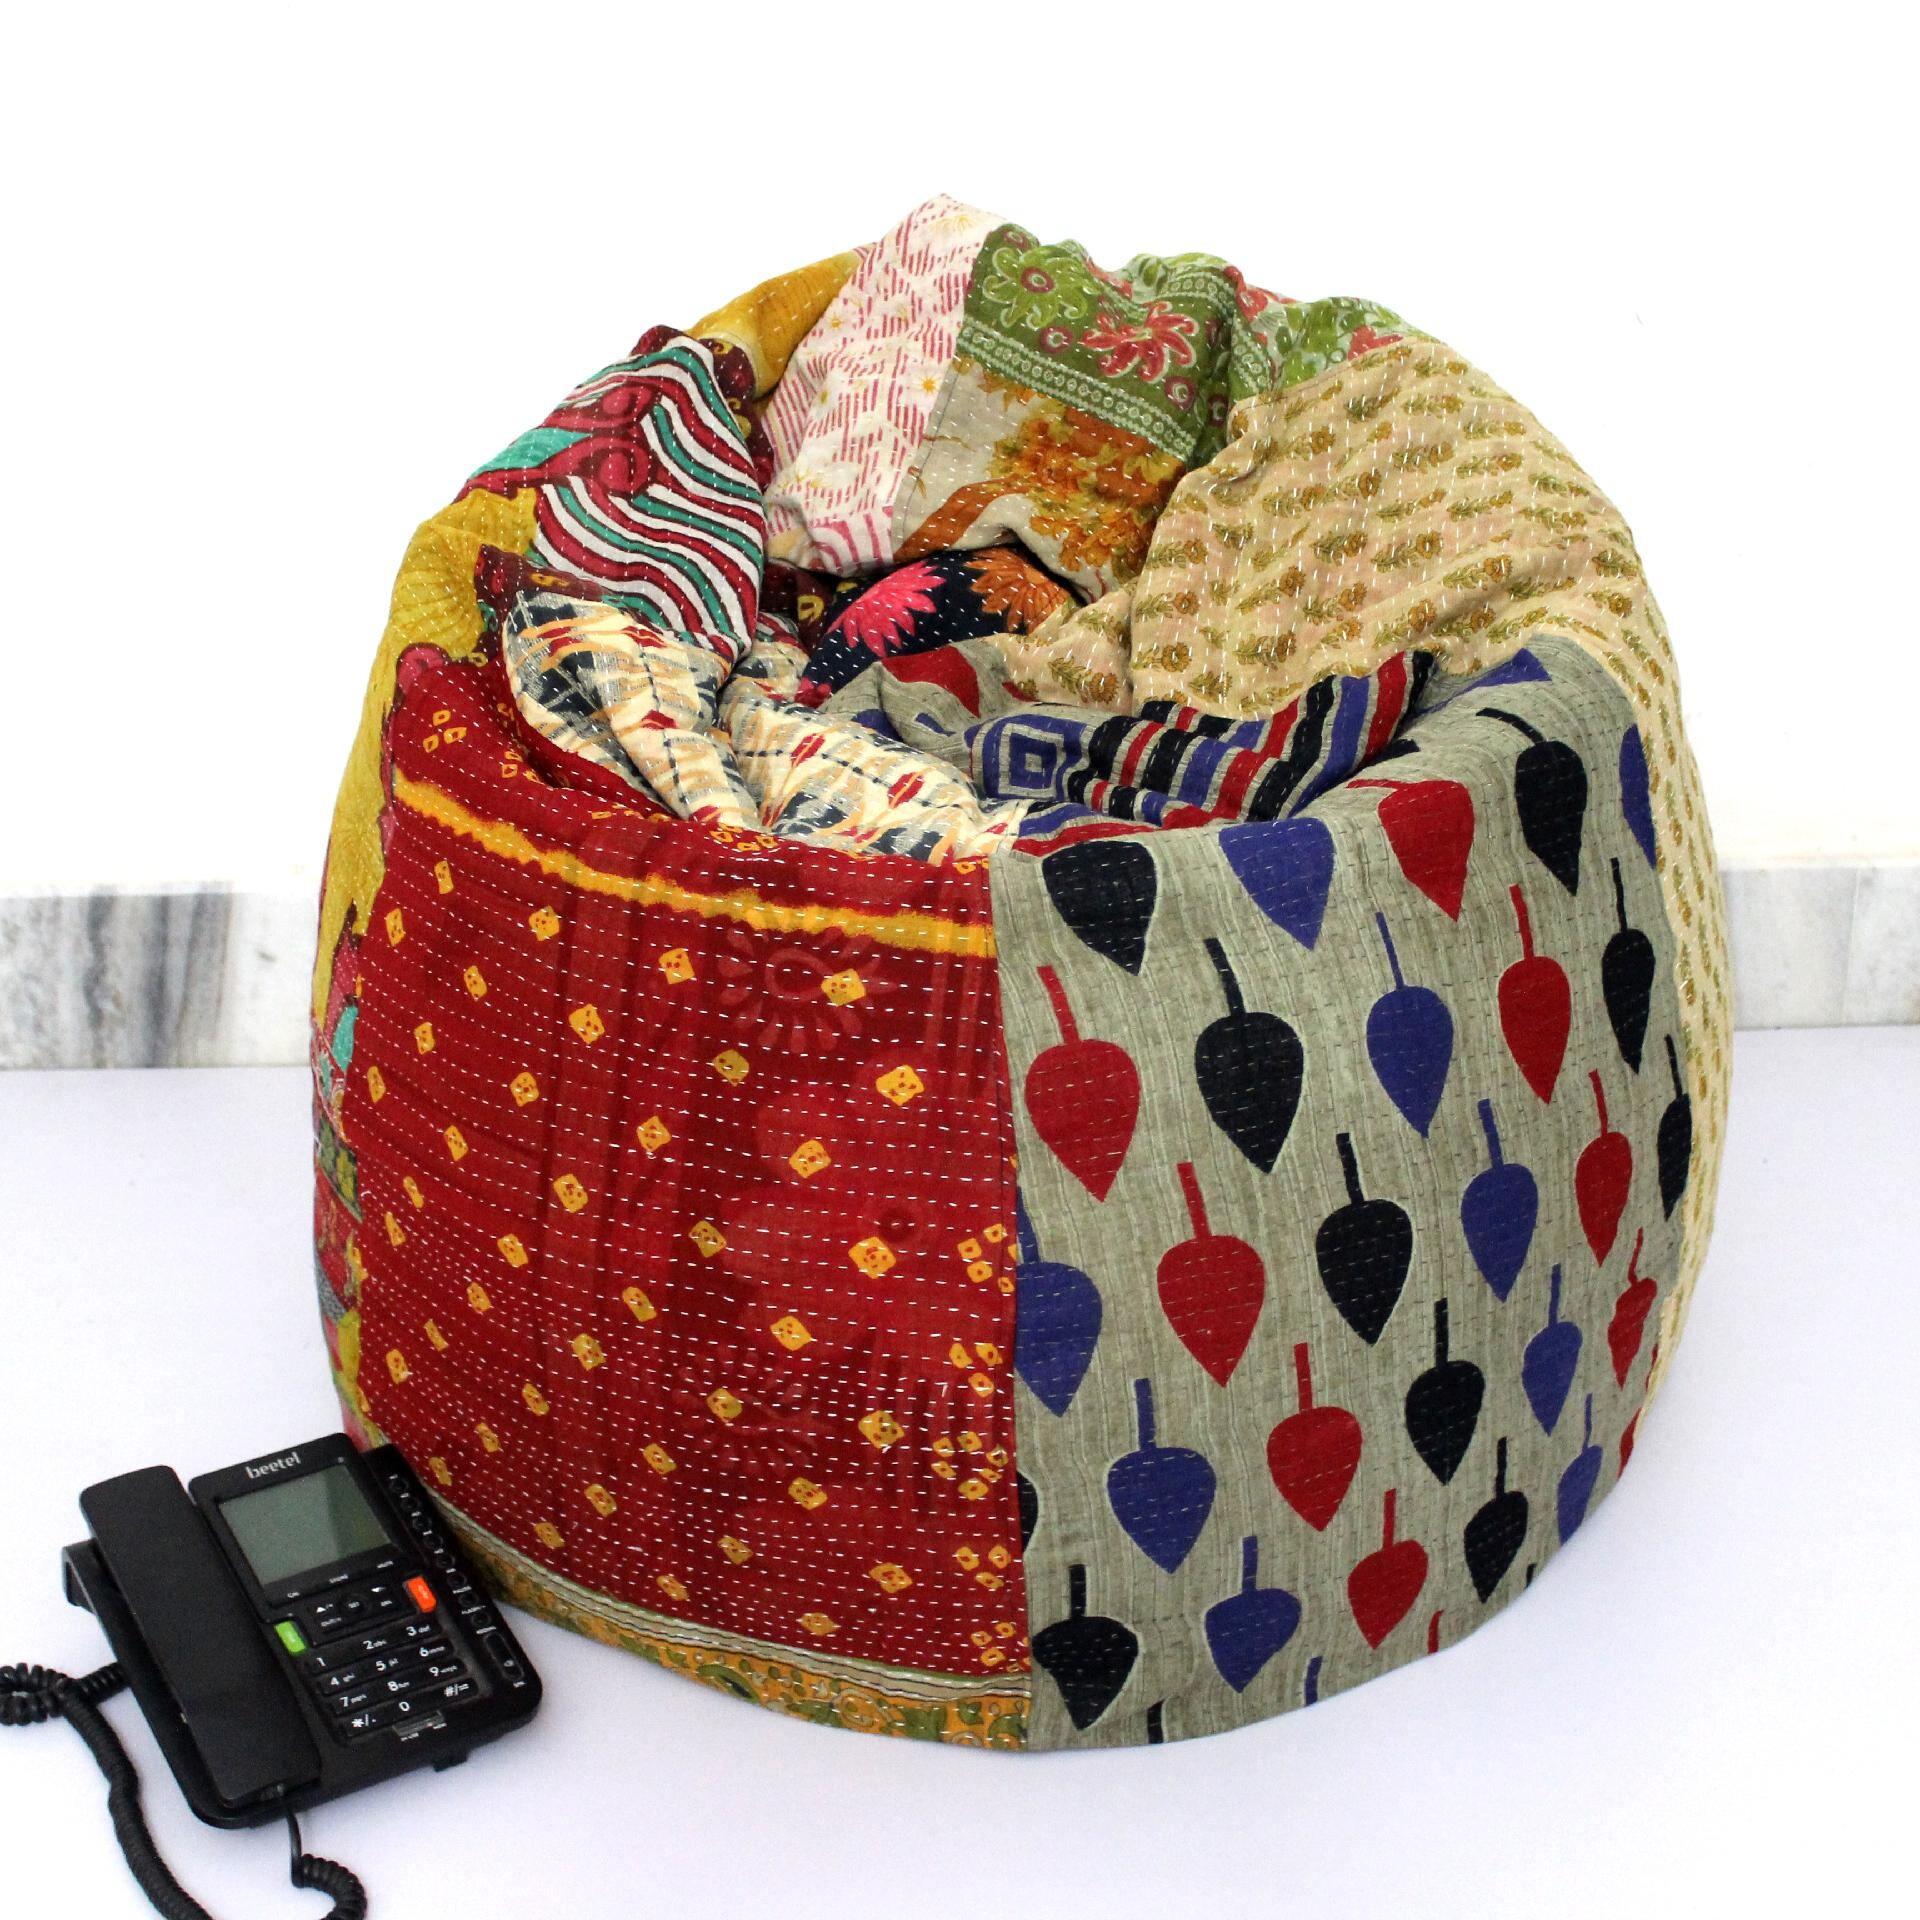 Handmade Quilted Cotton Floral Bohemian Bean Bag Chair Home